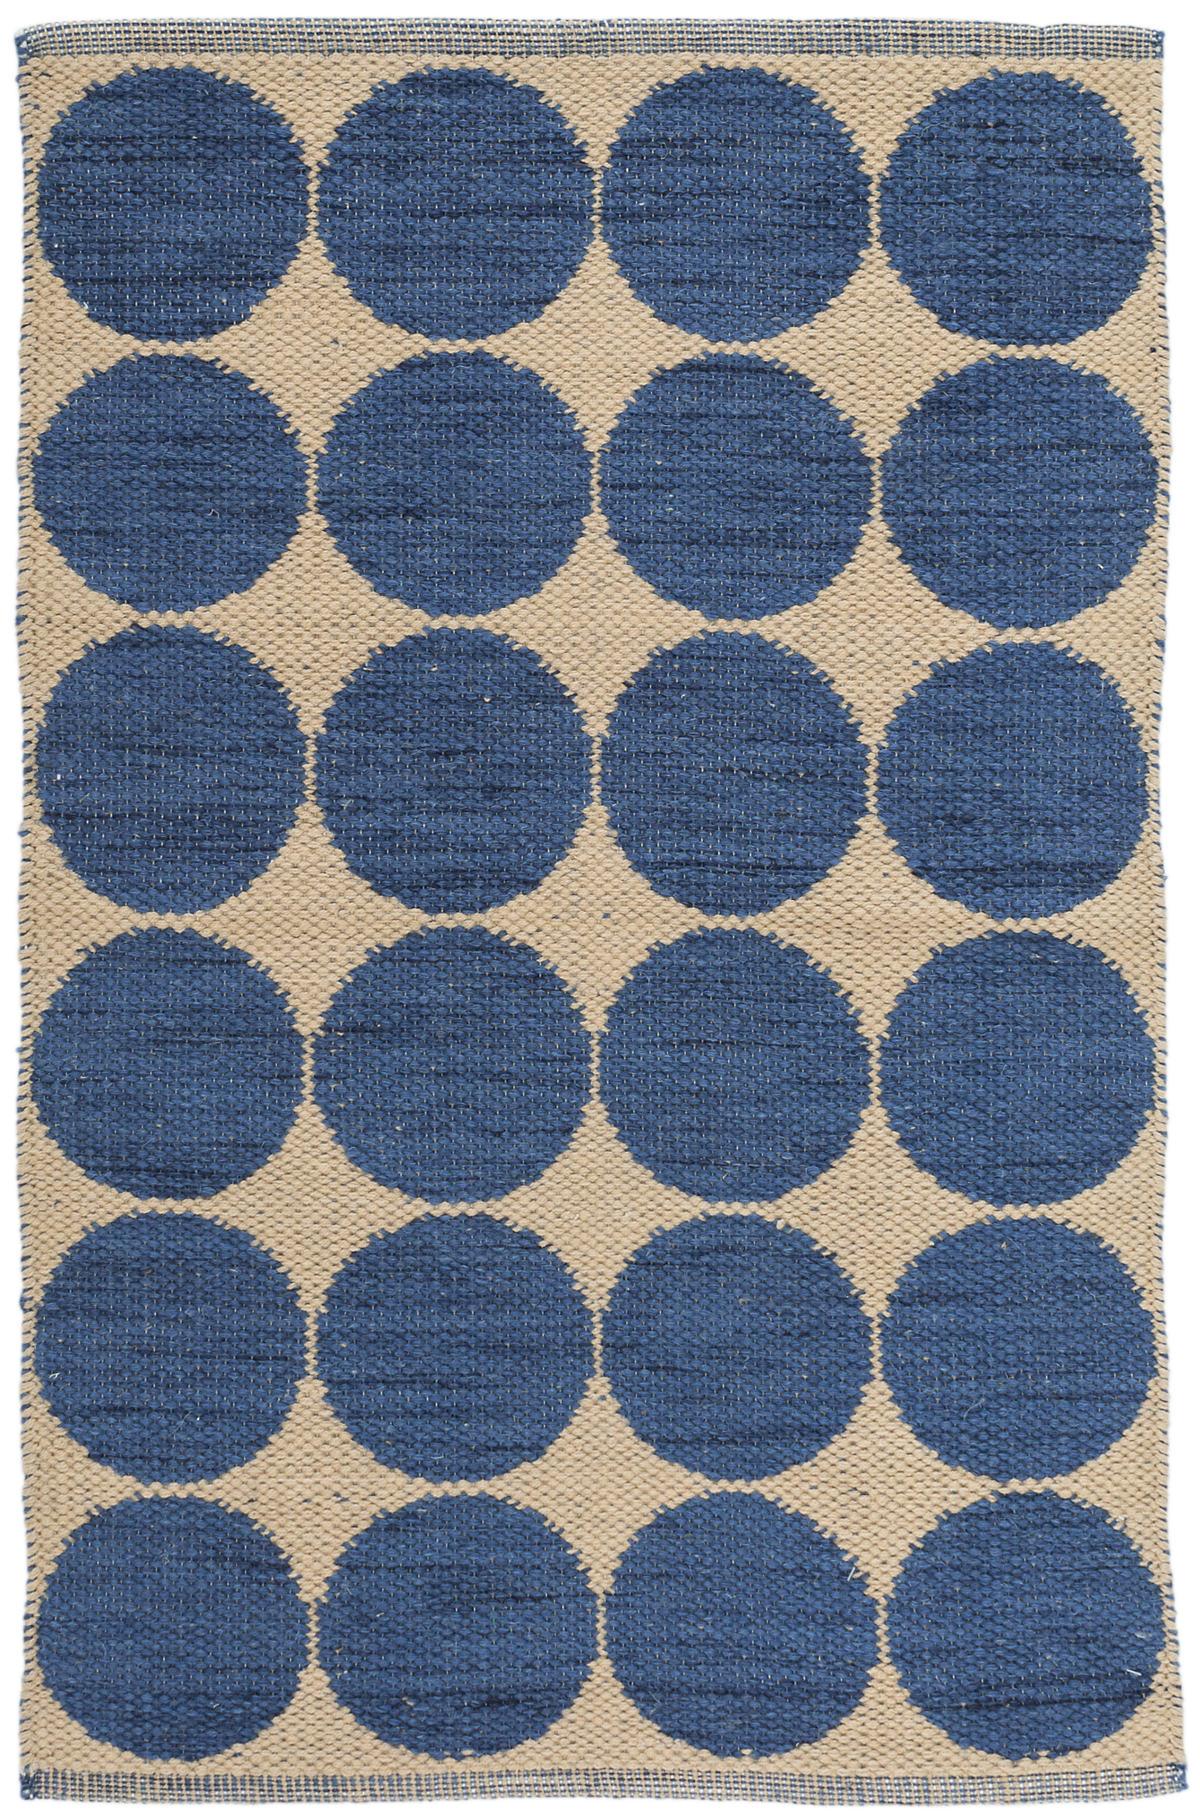 Orbit Blue Wool Woven Rug